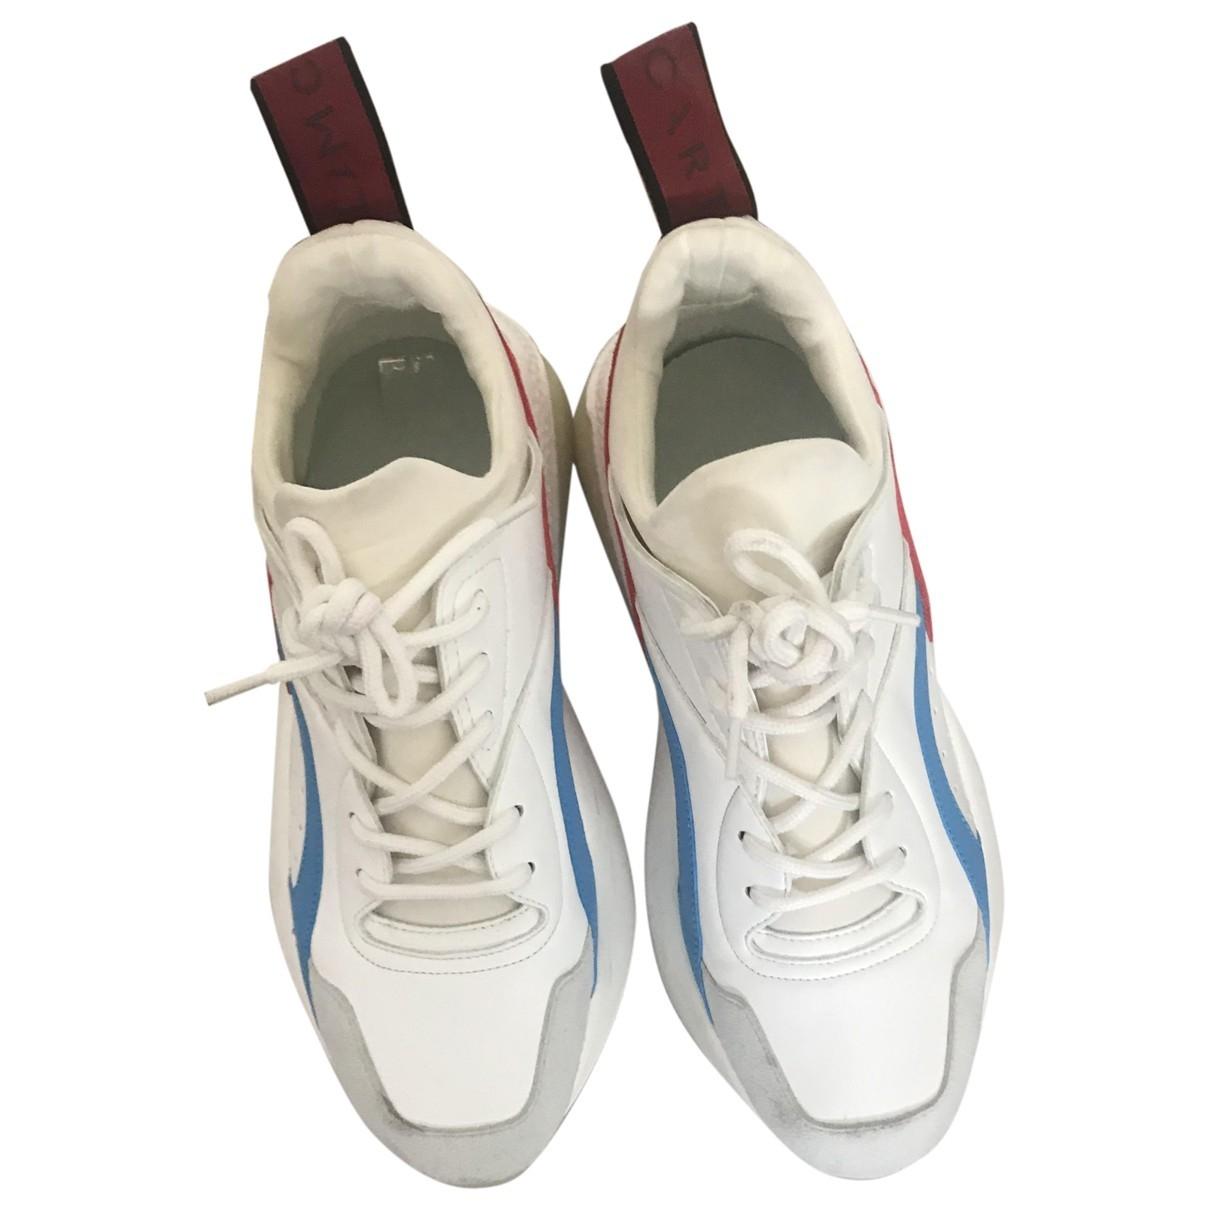 Stella Mccartney Eclypse White Cloth Trainers for Women 37 EU